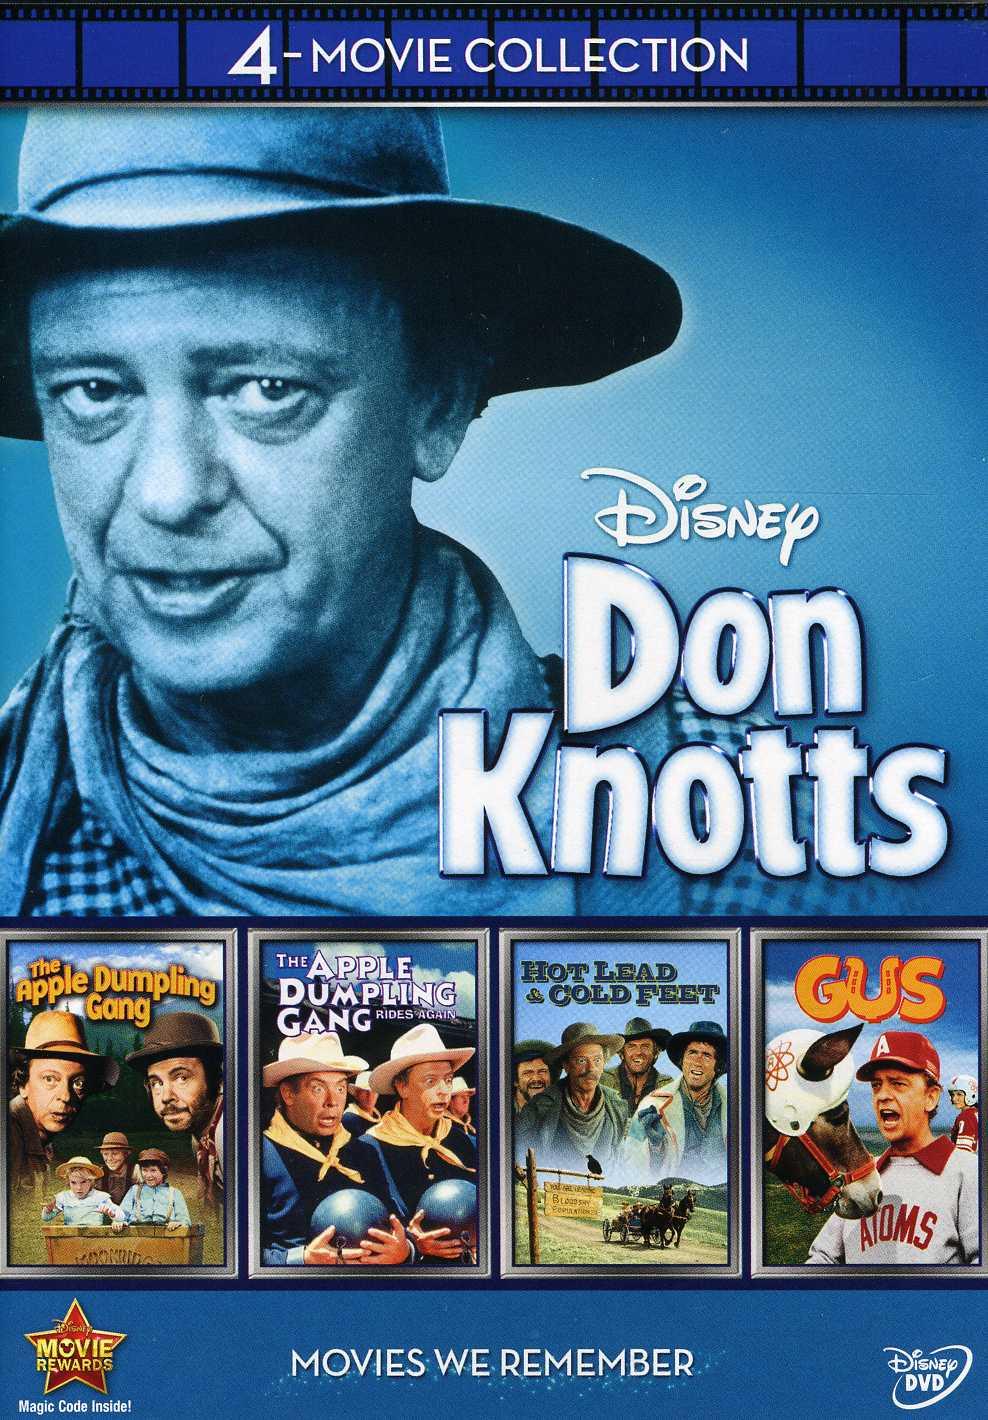 Disney 4-Movie Collection: Don Knotts (Apple Dumpling Gang / Apple Dumpling Rides Again / Gus / Hot Lead & Cold Feet) (DVD)